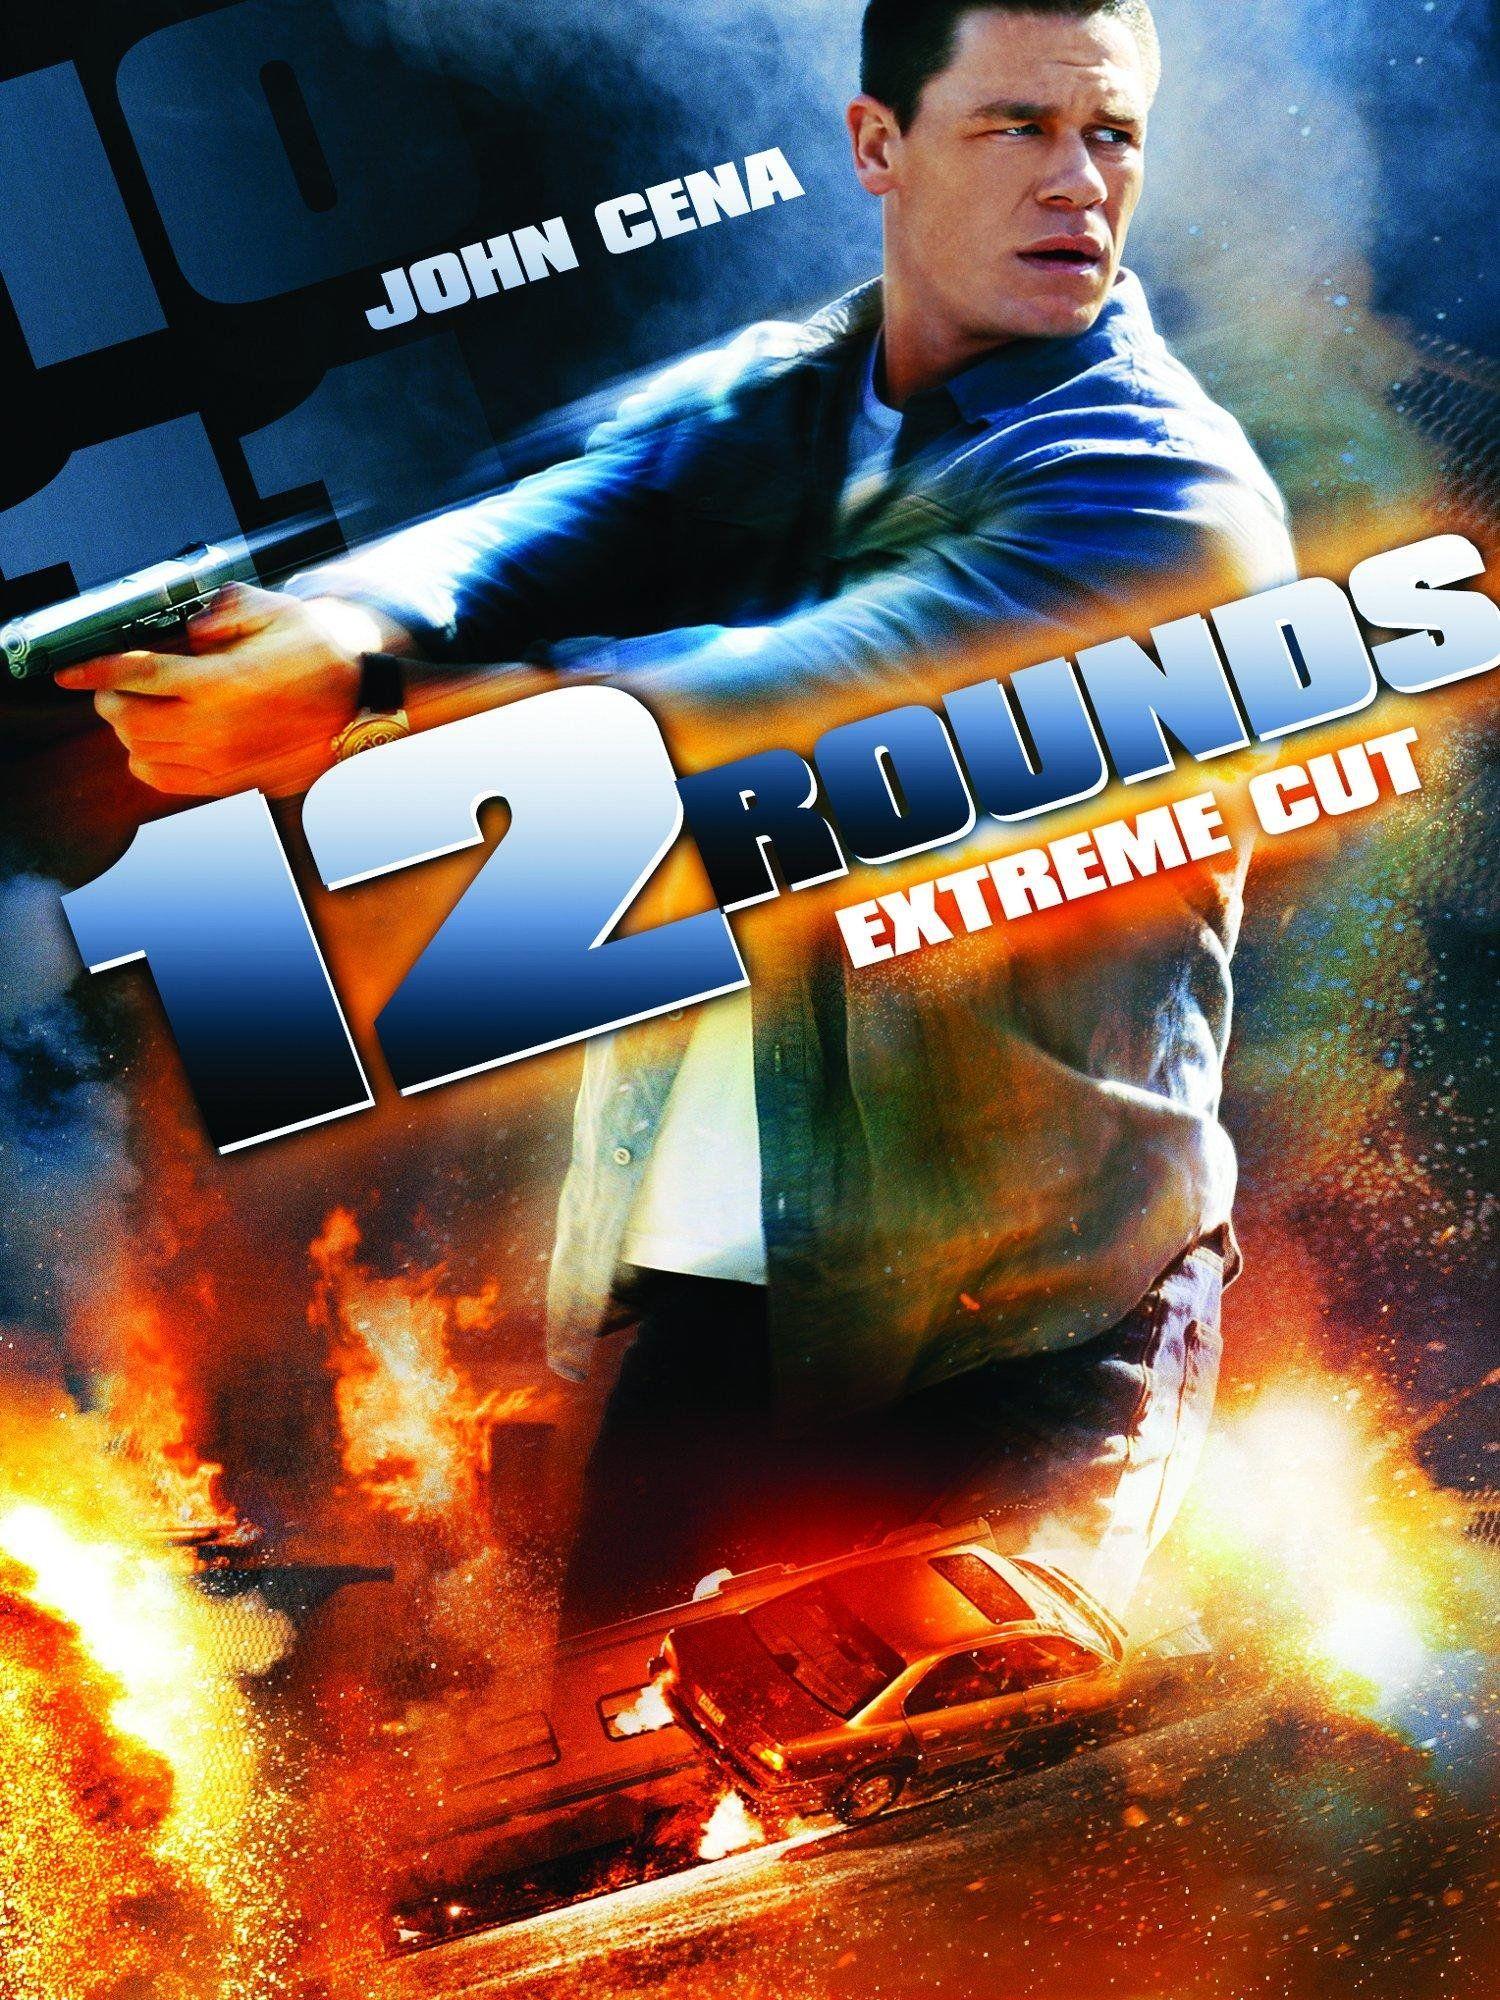 12 rounds ashley scott john cena movies